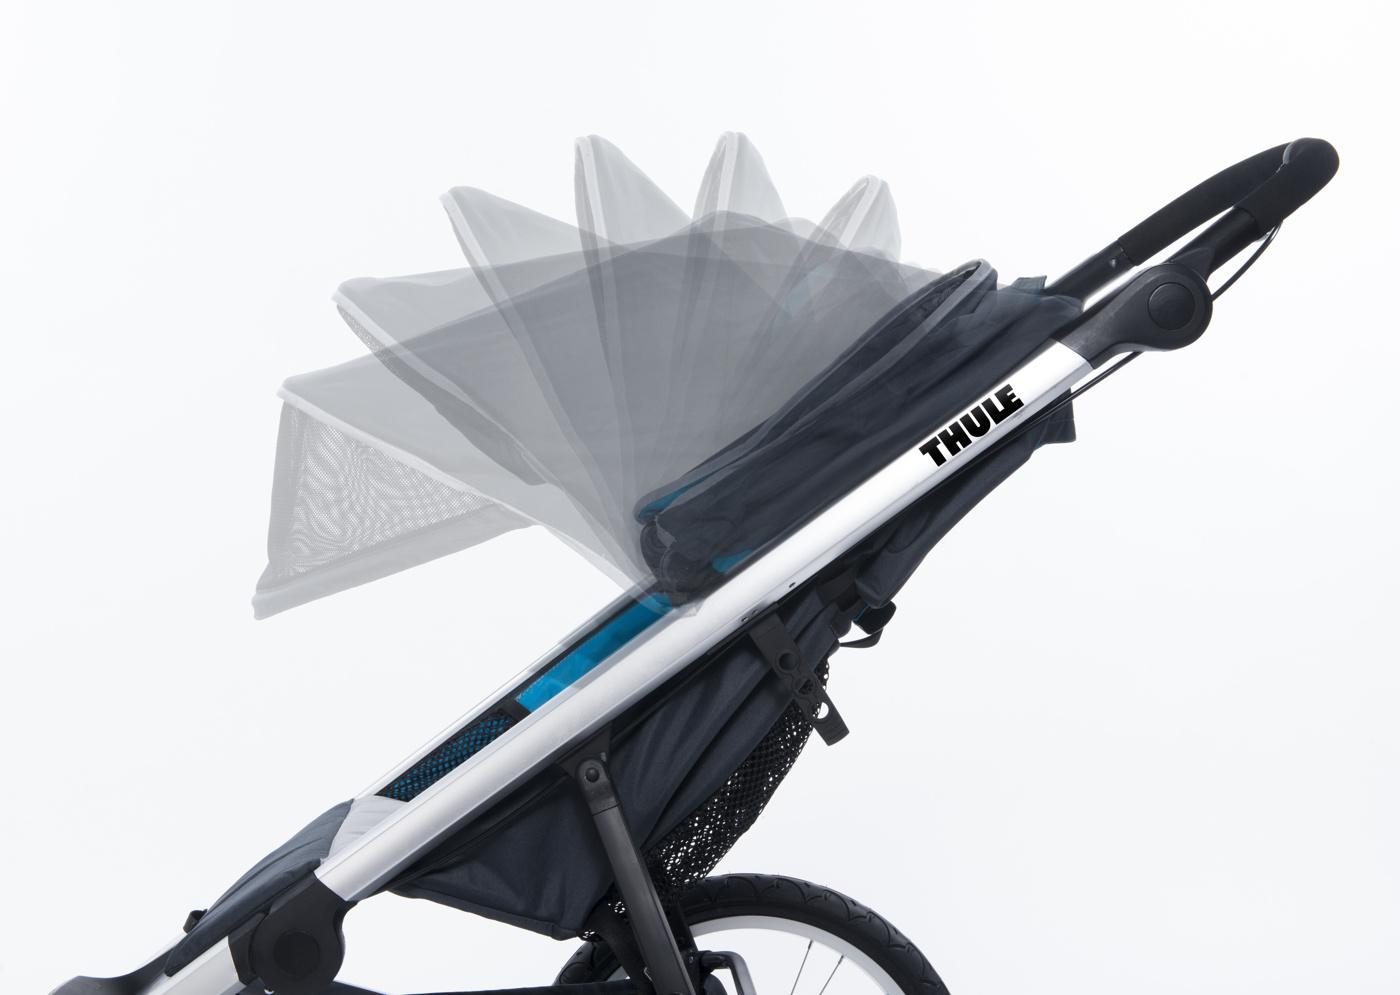 Thule_Glide_side_canopy_motion_10101901